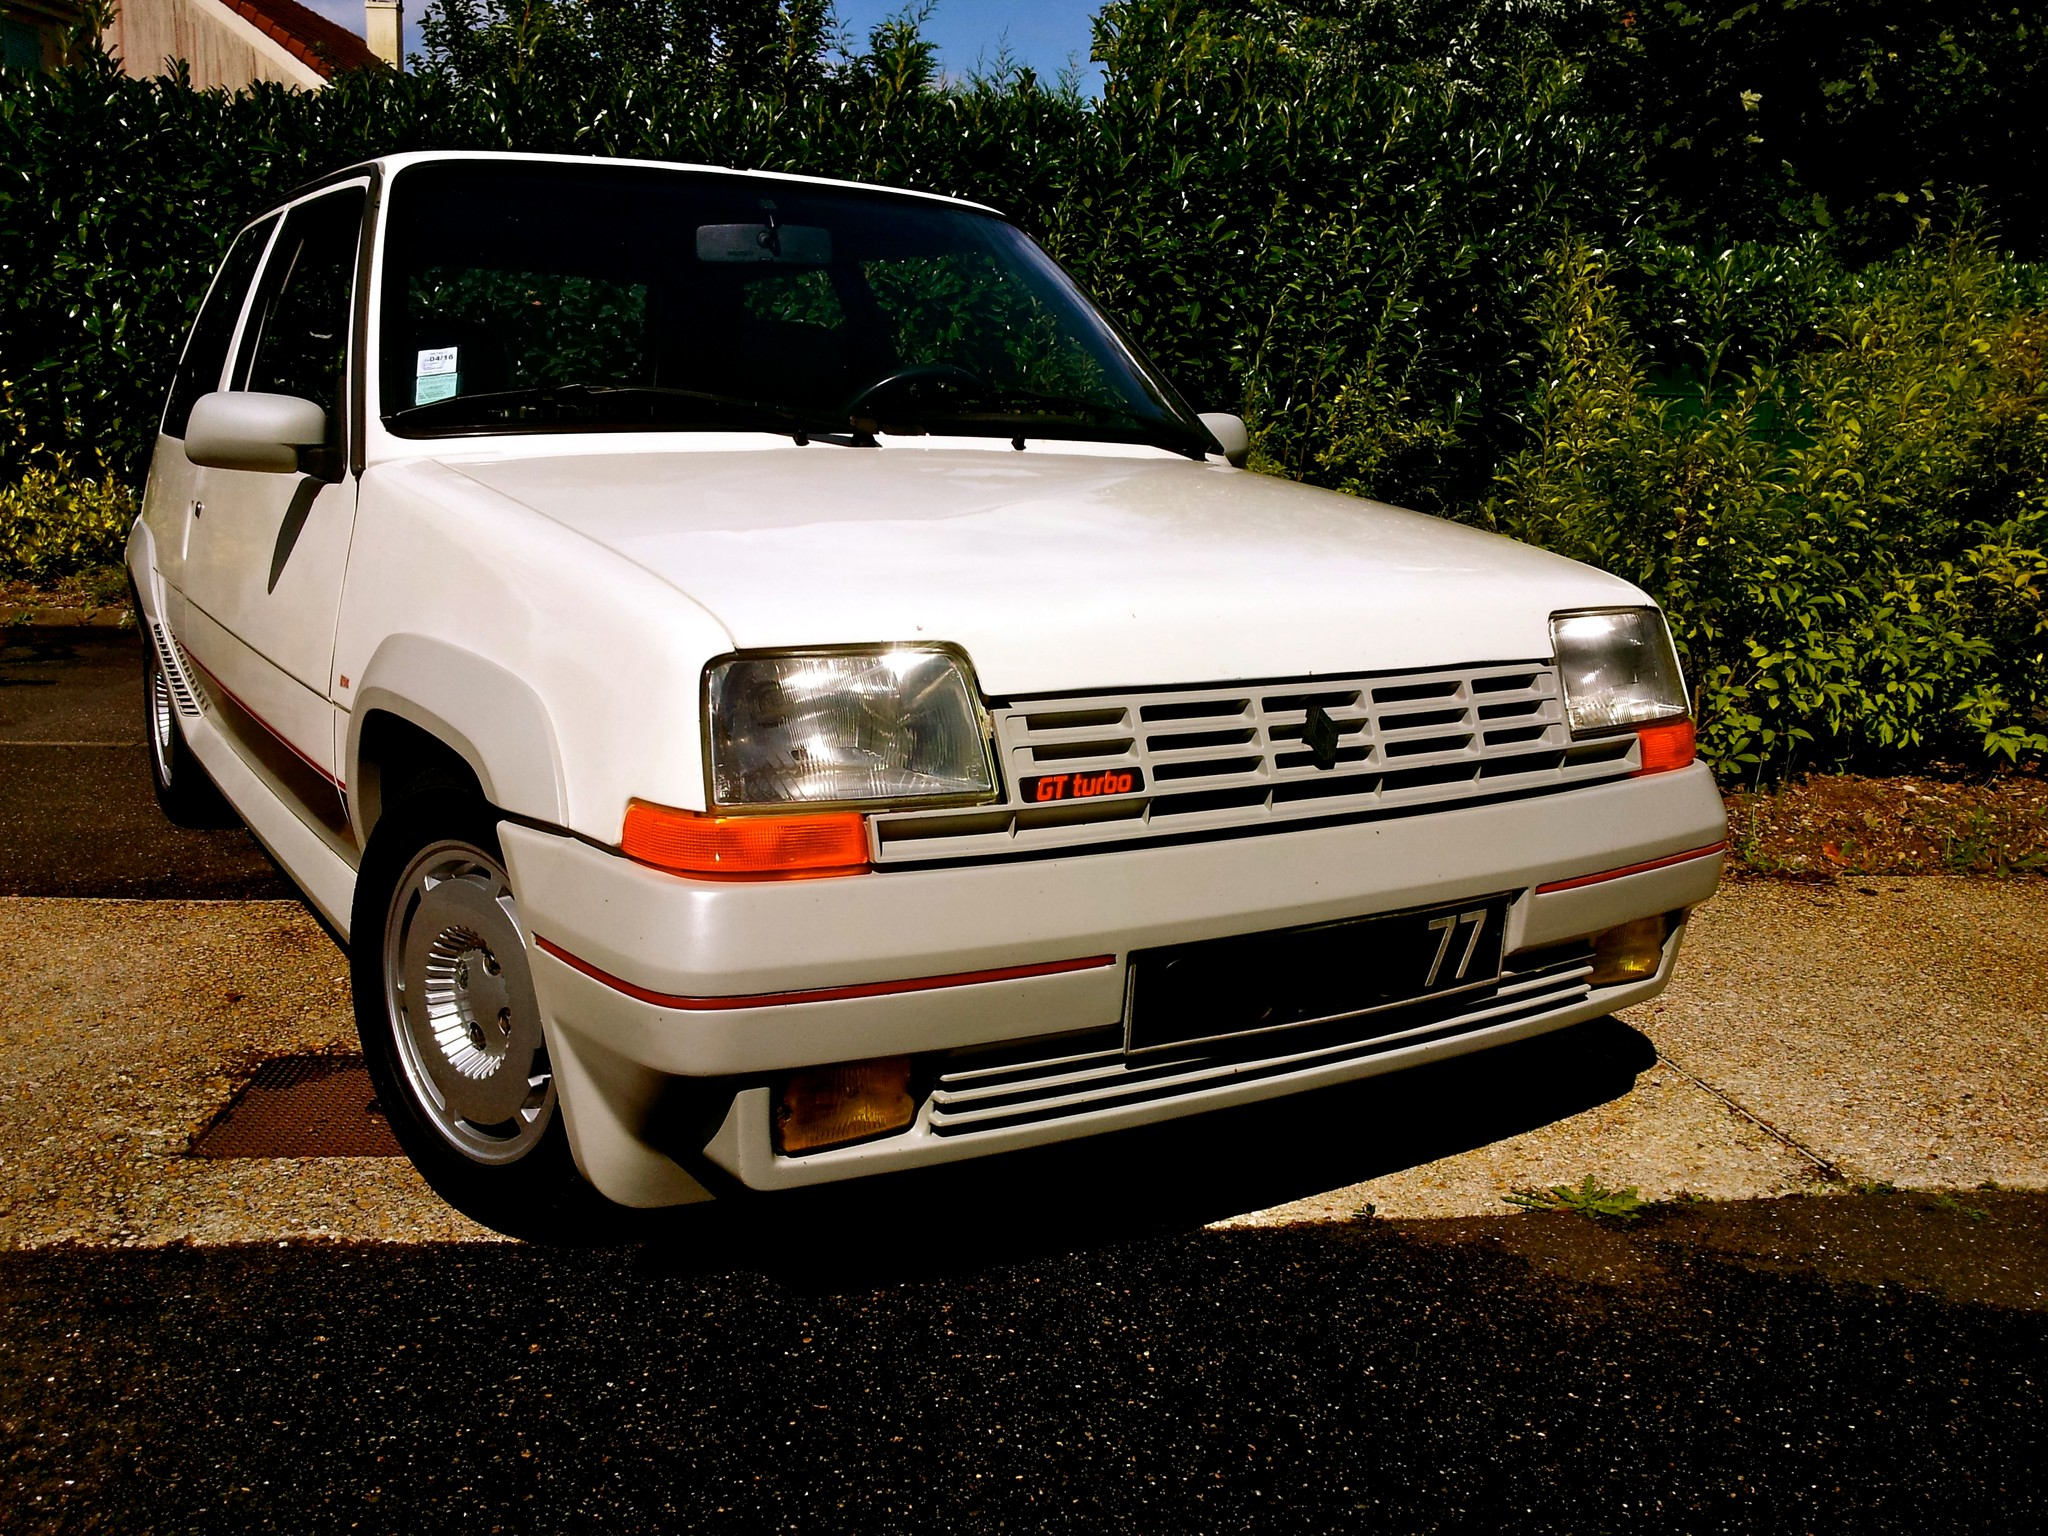 205 gti 1 6 115ch 1986 super 5 gt turbo phase 1 1986 page 47 auto titre. Black Bedroom Furniture Sets. Home Design Ideas